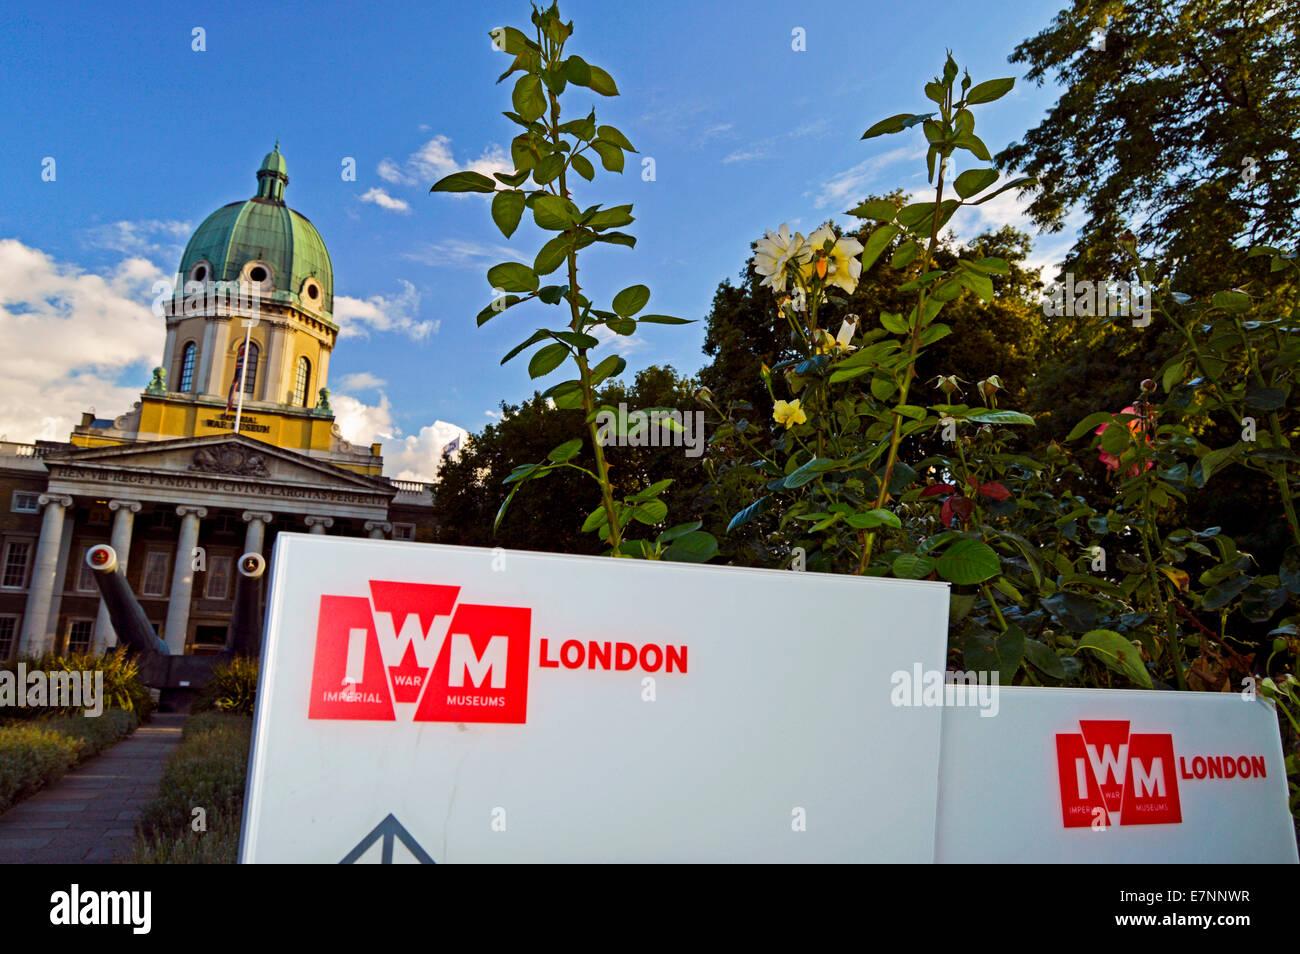 The Imperial War Museum (IWM), London Borough of Lambeth, London, England, United Kingdom - Stock Image